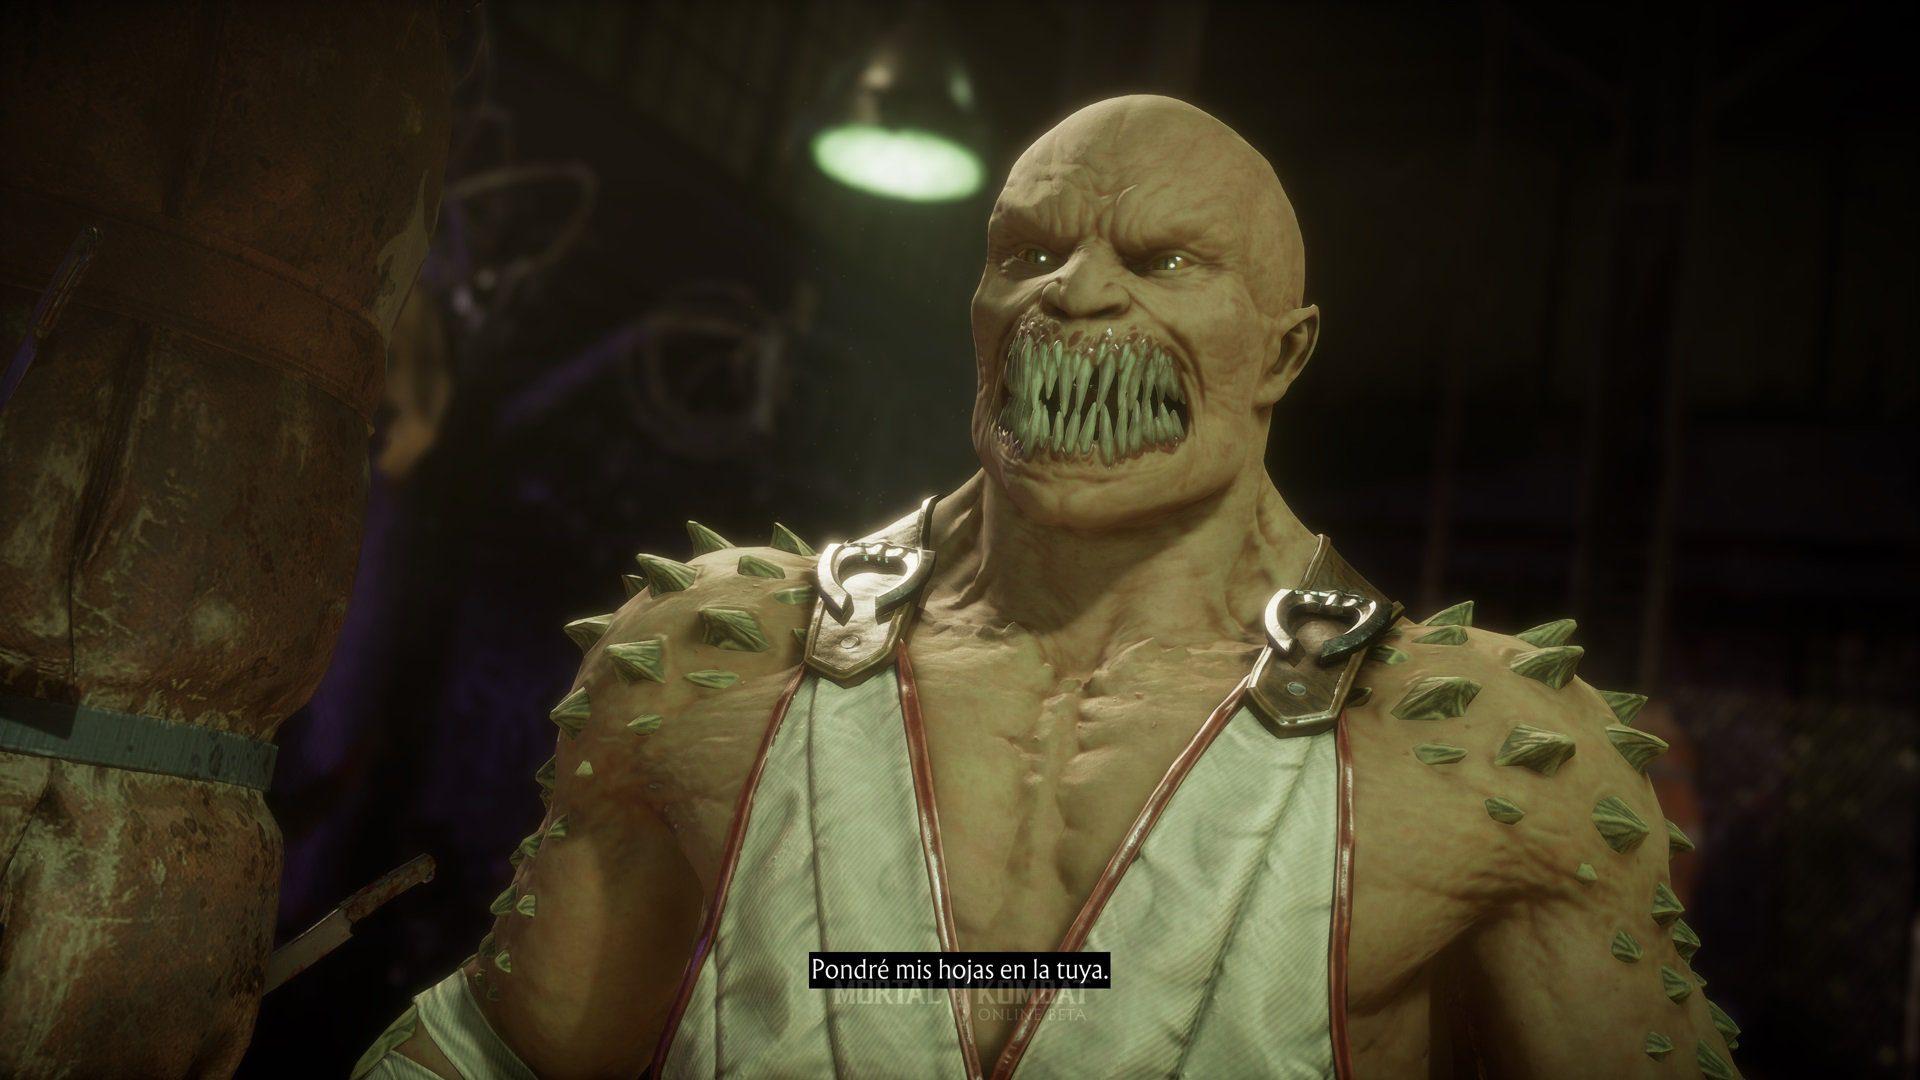 Mortal Kombat 11 beta